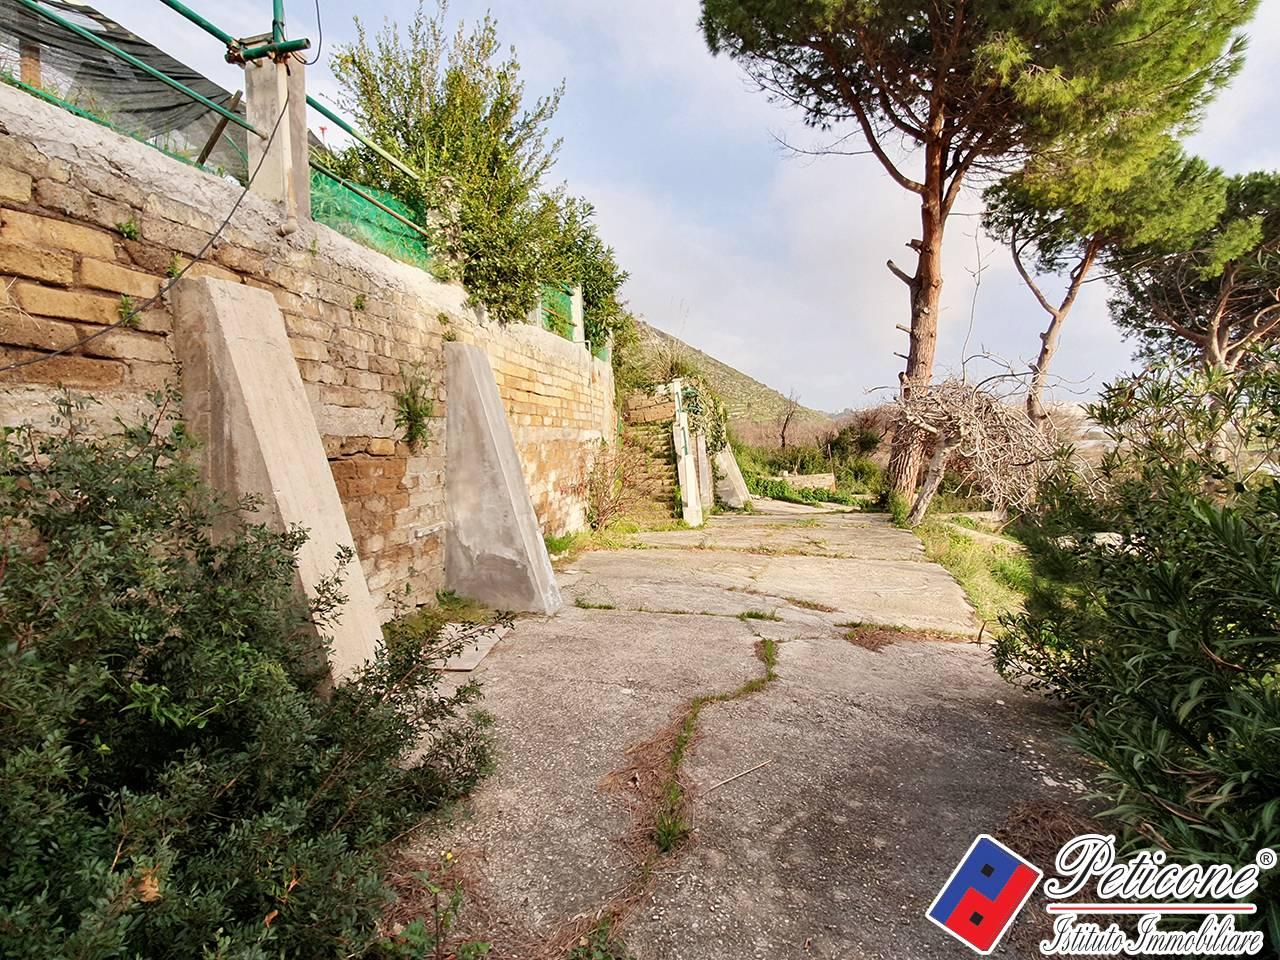 Villa in Vendita a Sperlonga: 3 locali, 50 mq - Foto 4